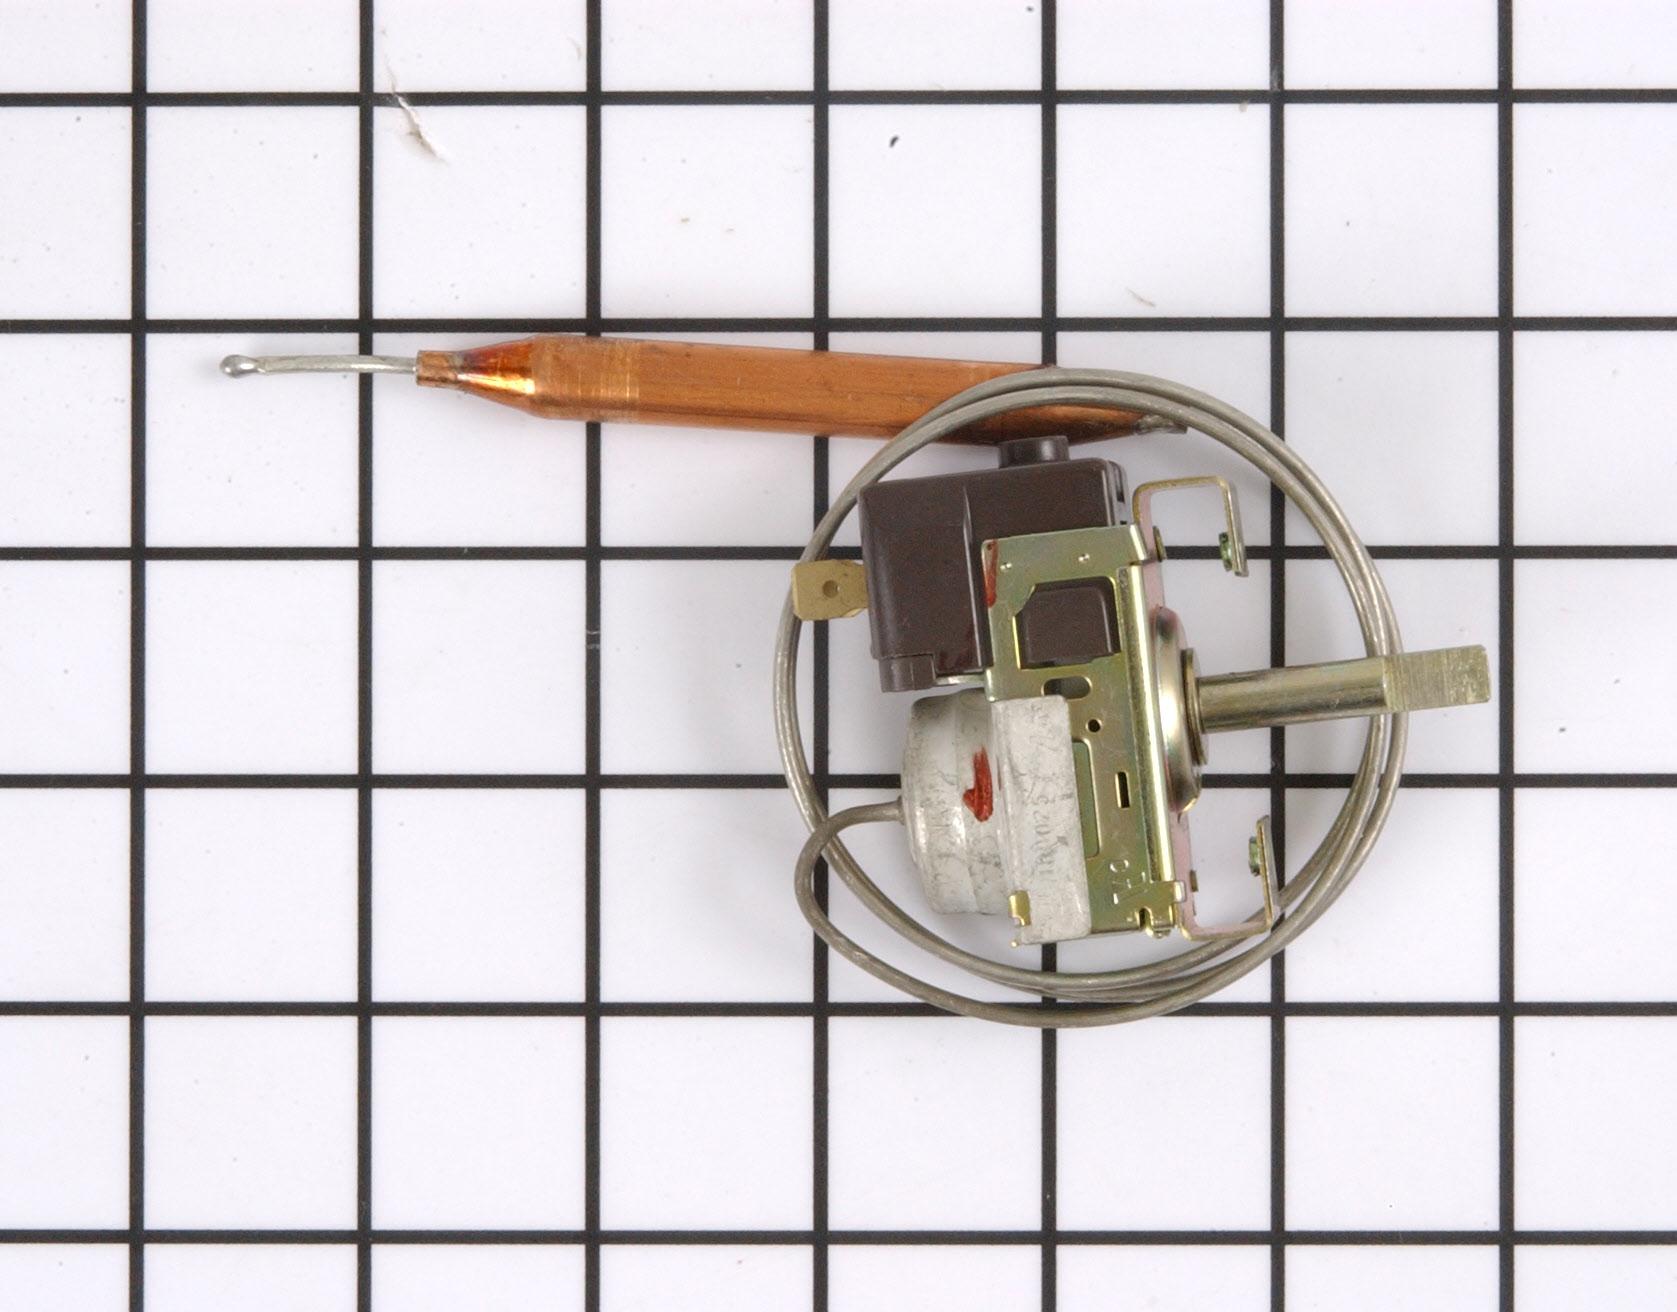 Kenmore Air Conditioner Part # 5303201838 - Temperature Control Thermostat